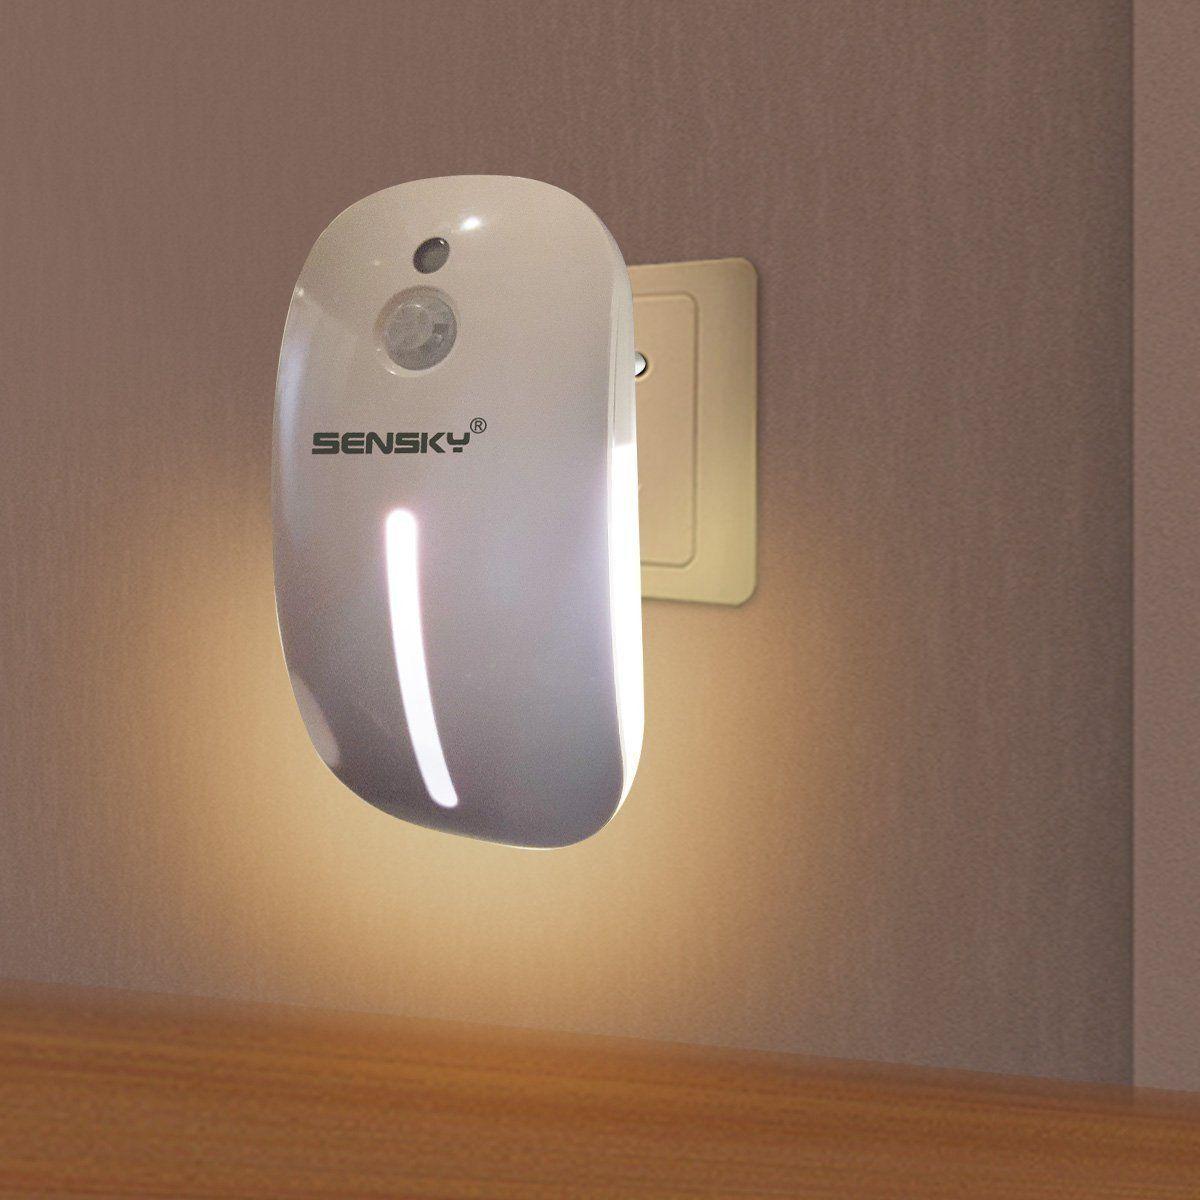 Sensky skl001 plug in motion sensor light motion - Sensor de movimiento luz ...